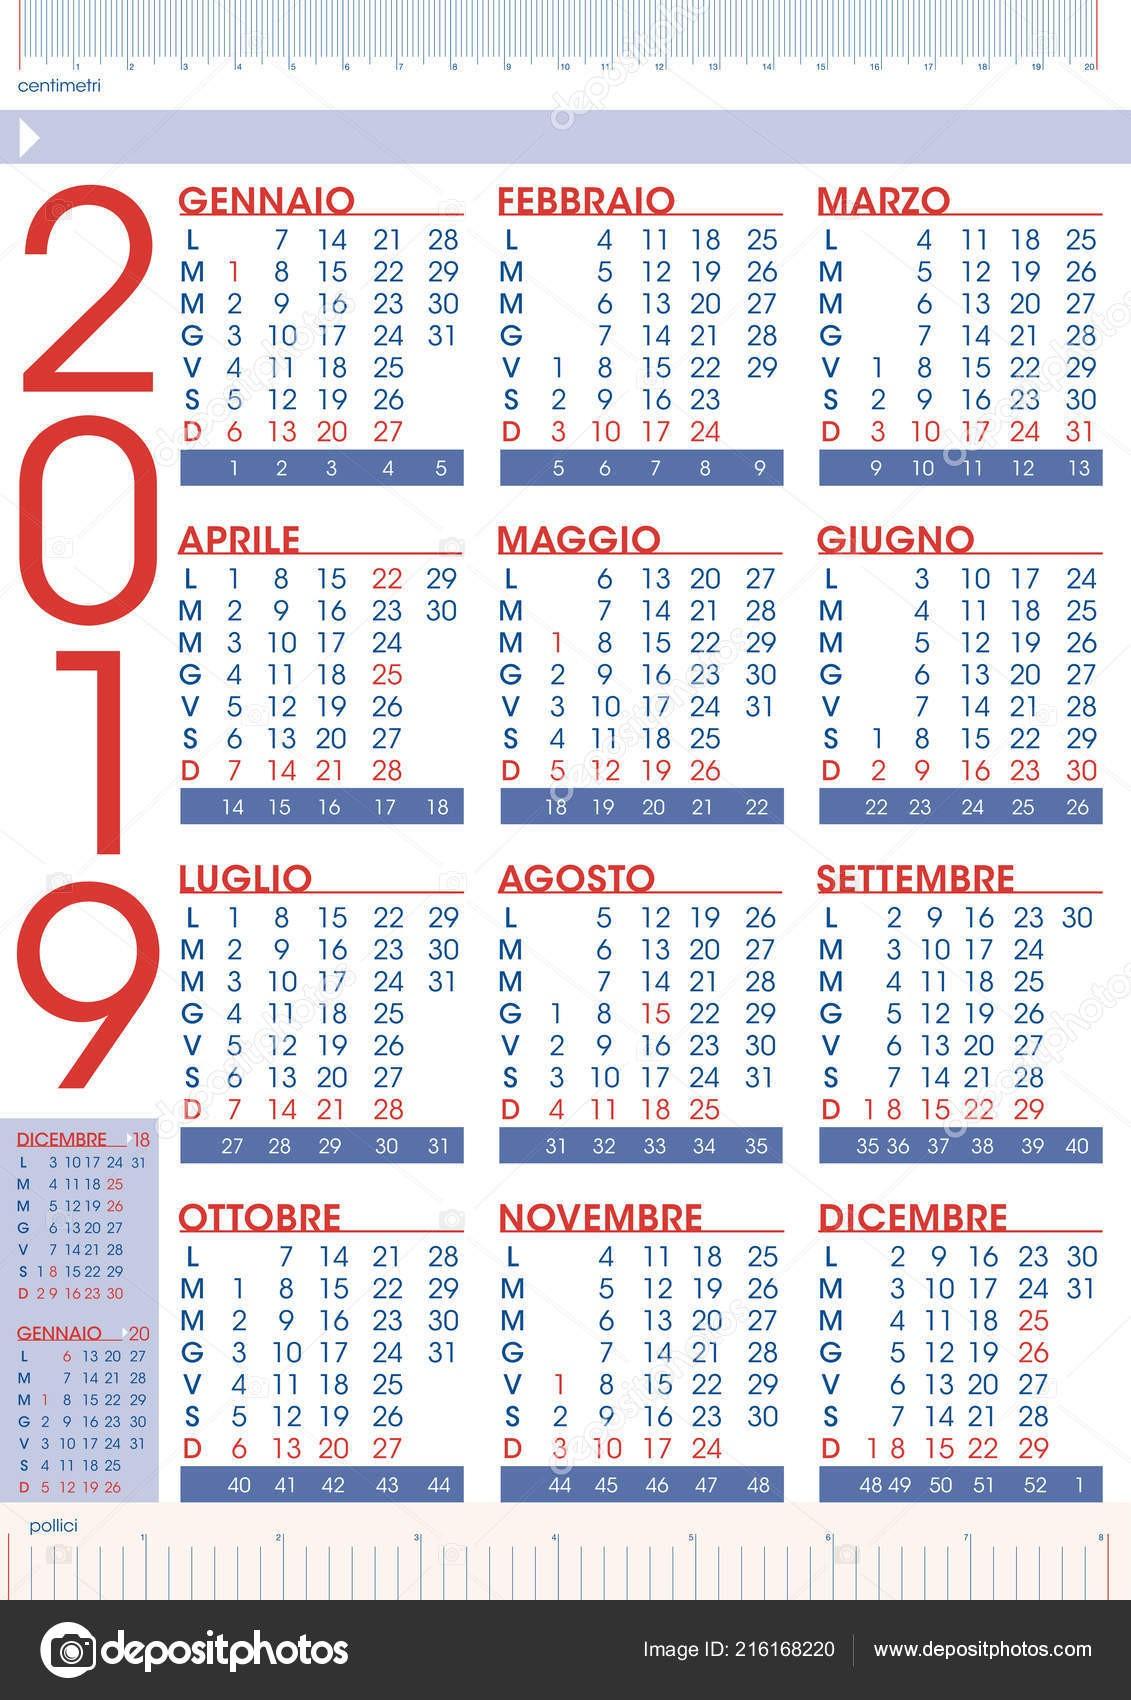 Calendario 2019 Mexico Con Festivos Recientes Obchodn Pravidla 2019 Kalendář Italském Jazyce Státn Svátky Počet Of Calendario 2019 Mexico Con Festivos Más Caliente Nautical Free Free Nautical Charts & Publications E Page Version